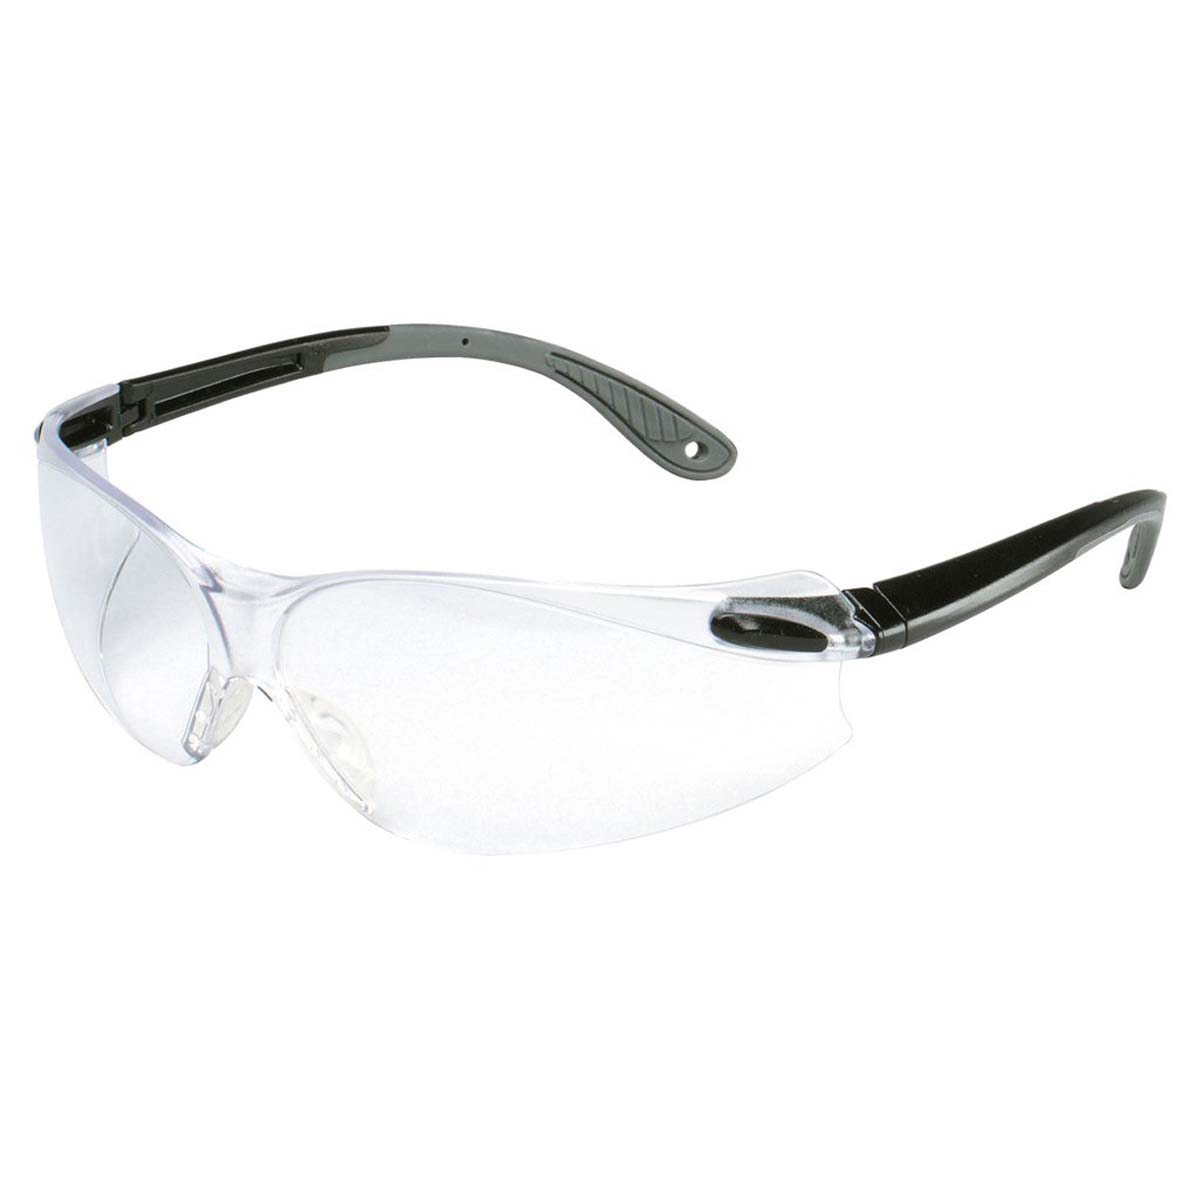 "3Mâ""¢ Virtuaâ""¢ V4 Protective Eyewear 11674-00000-20 I/O Mirror Lens, Black/Gray Temple"